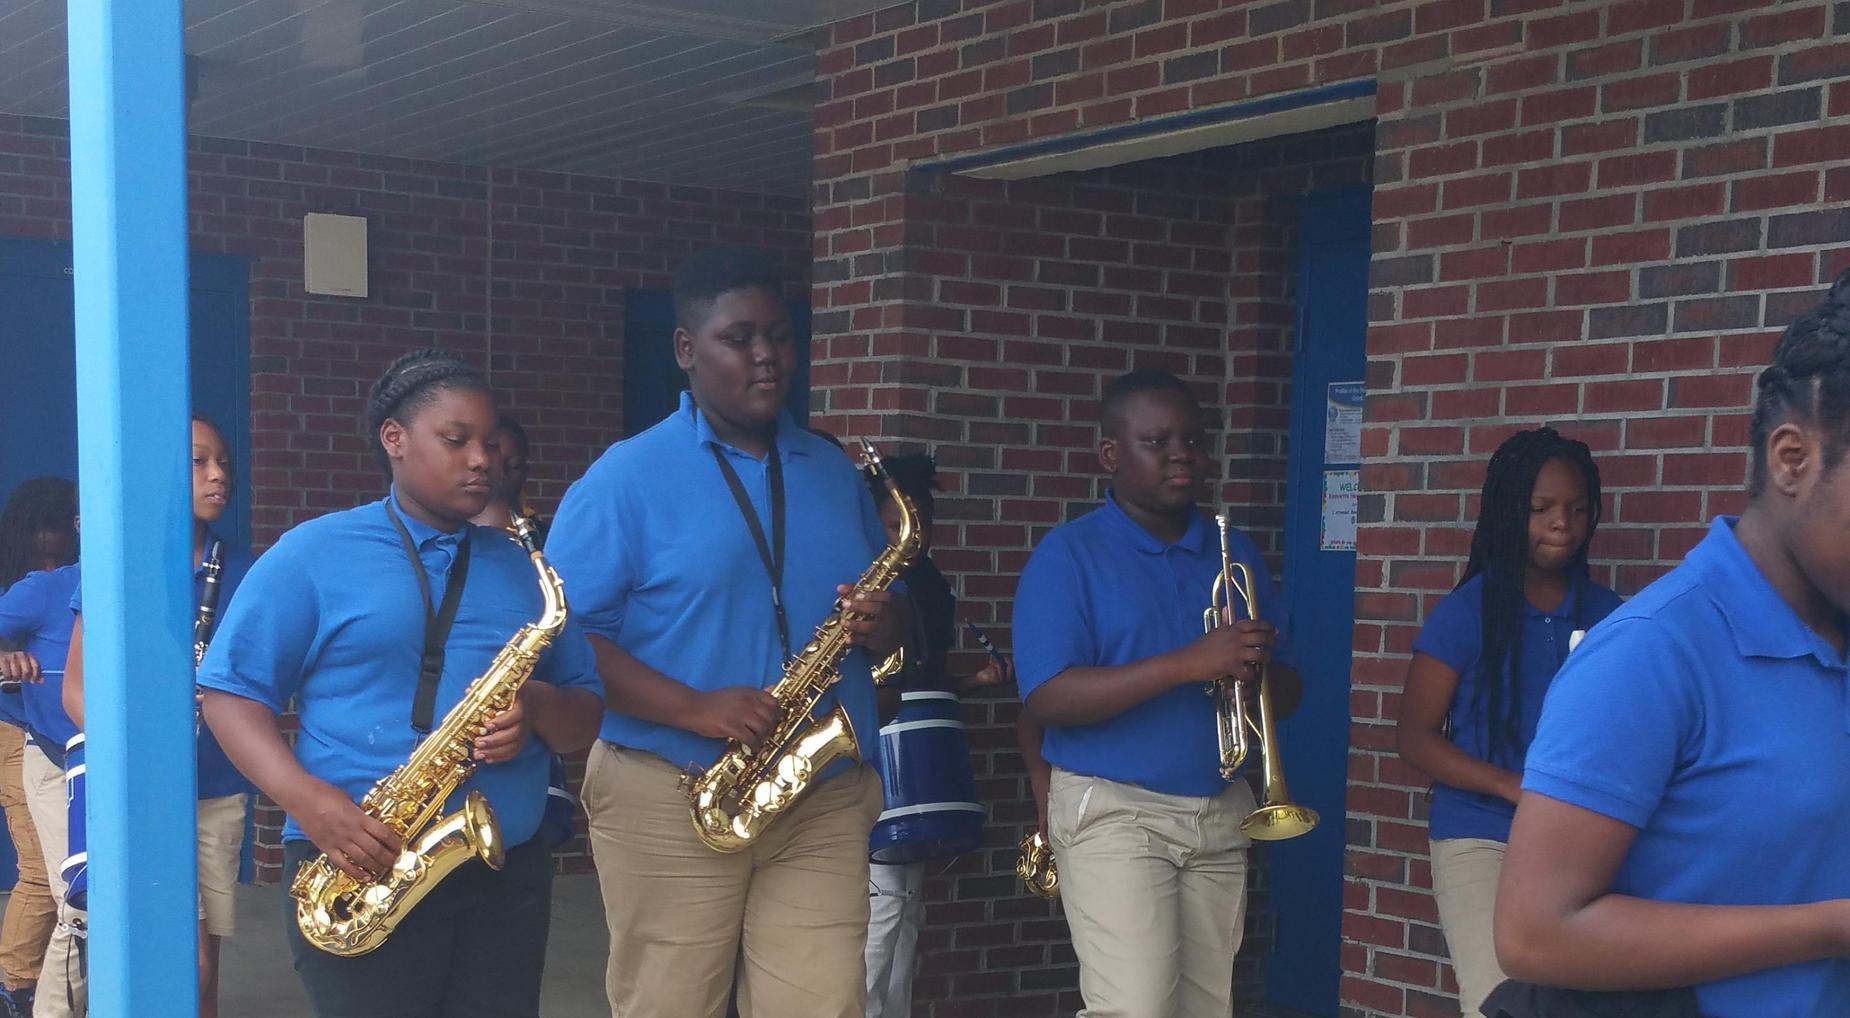 Lower Lee Elementary school band